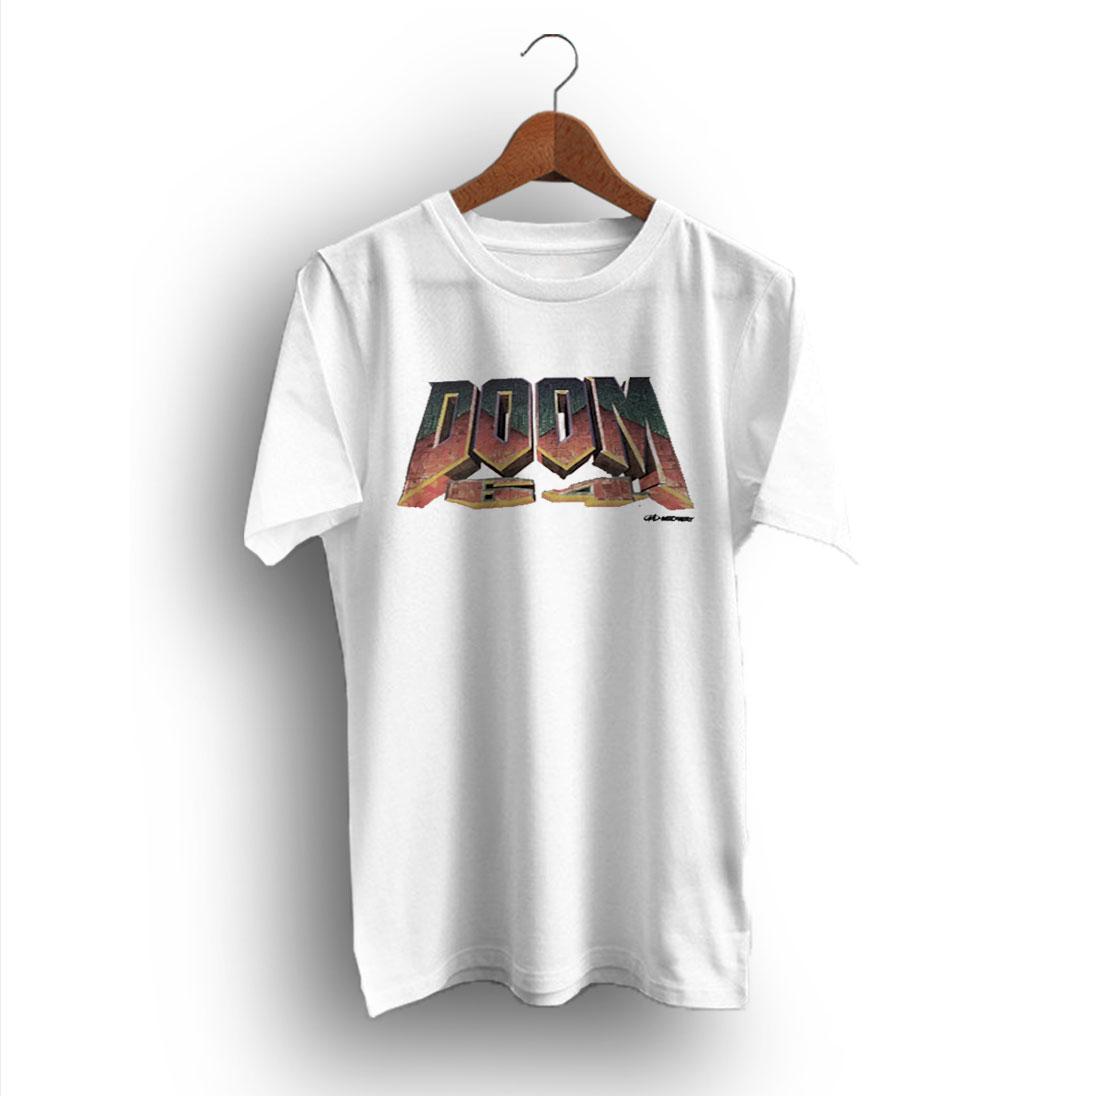 DOOM Super high quality premium black regular T Shirt